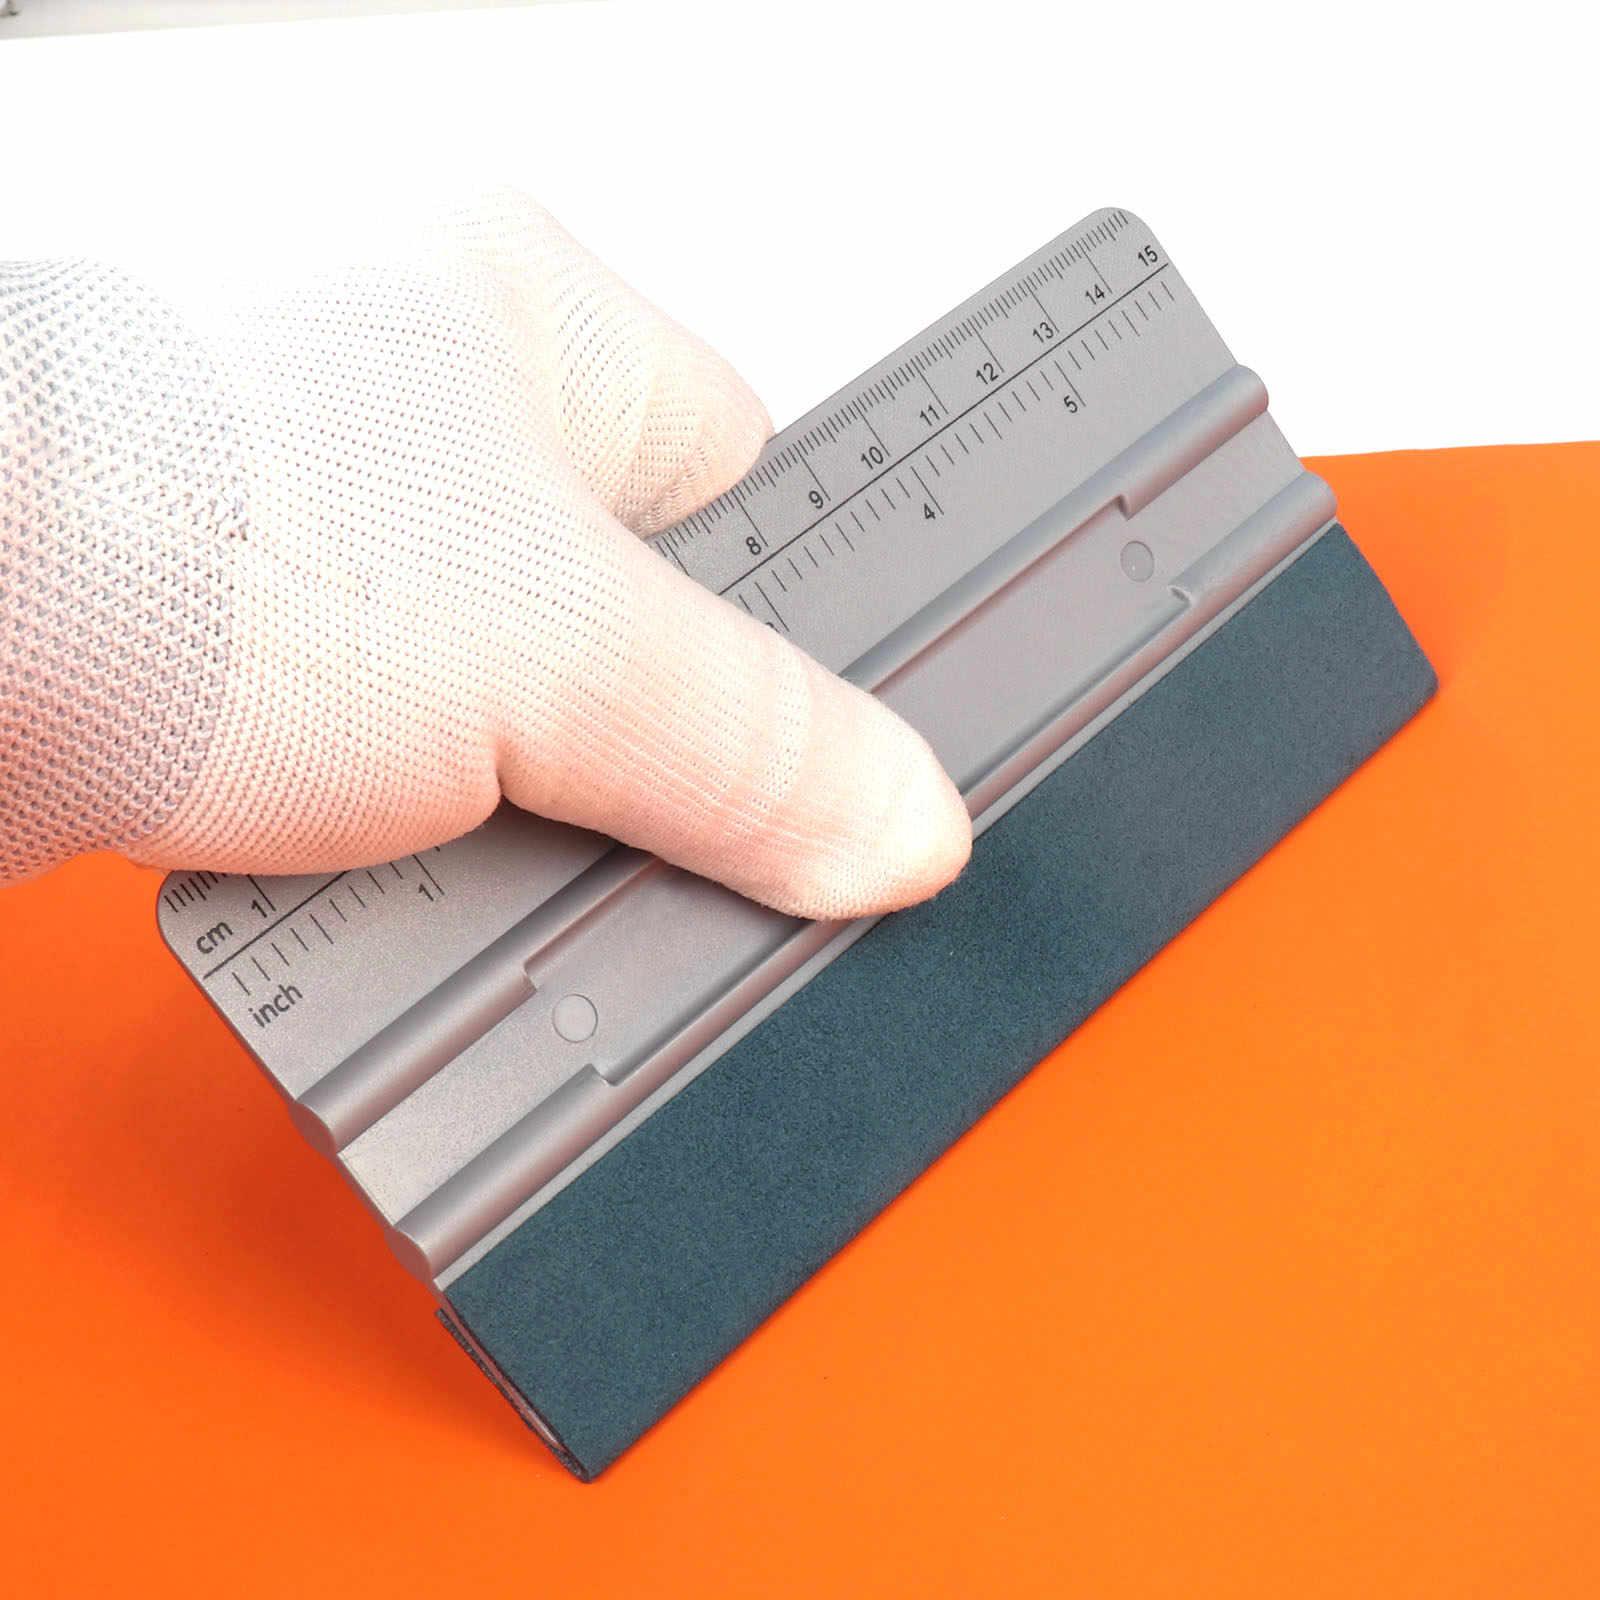 EHDIS รถ 4PCS ชุดเครื่องมือไวนิลห่อฟิล์มแม่เหล็ก Tuck Stick Squeegee ขนาด Suede Scraper คาร์บอนไฟเบอร์สติกเกอร์หน้าต่าง tinting TOOL